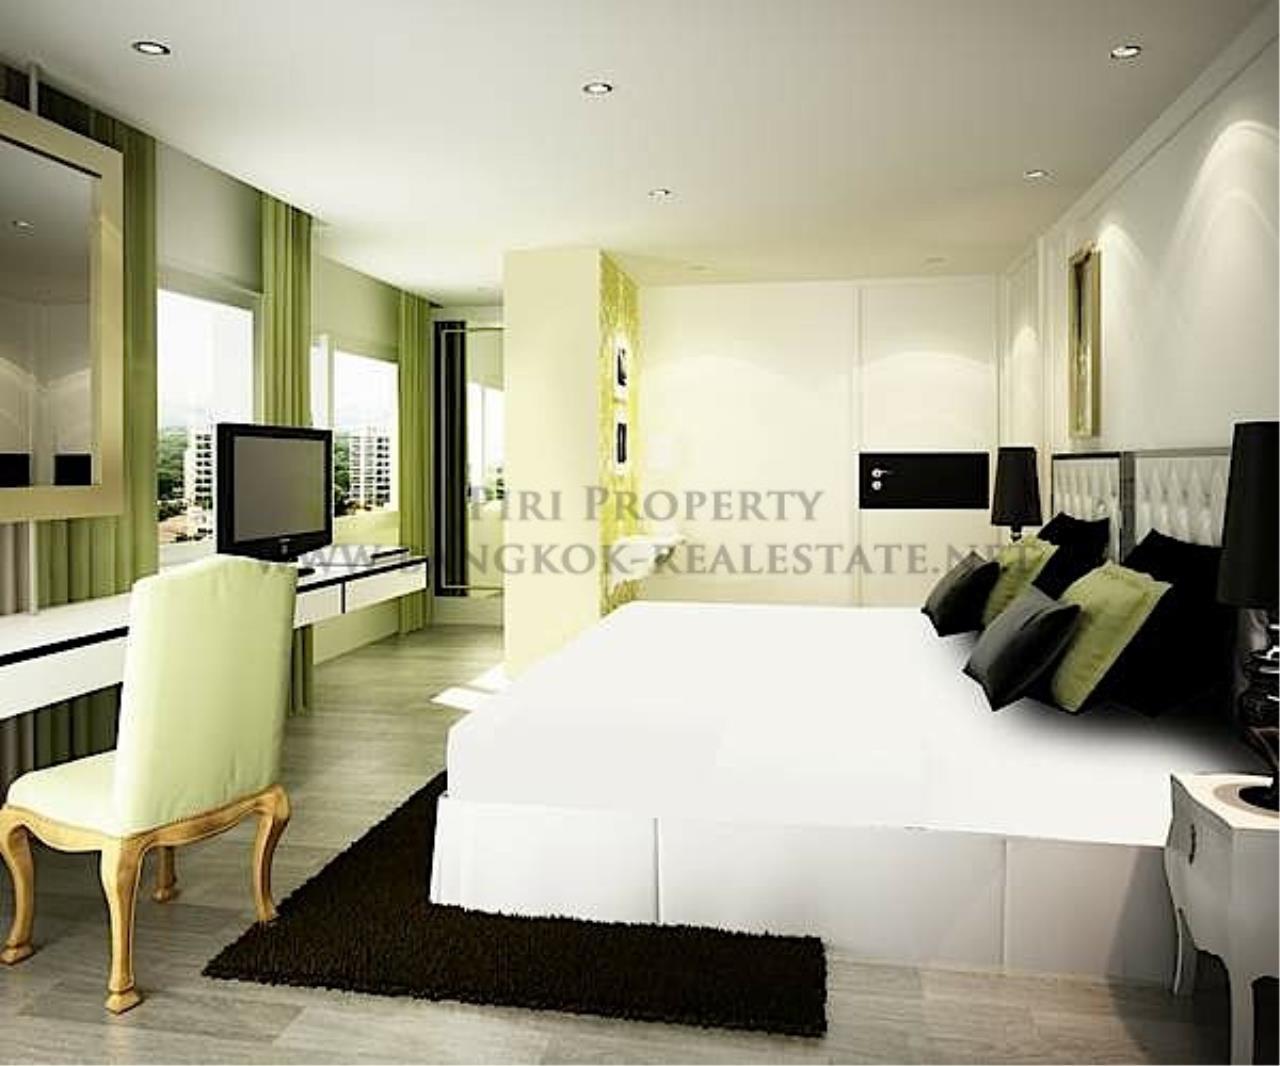 Piri Property Agency's Penthouse Executive Serviced Apartment  4